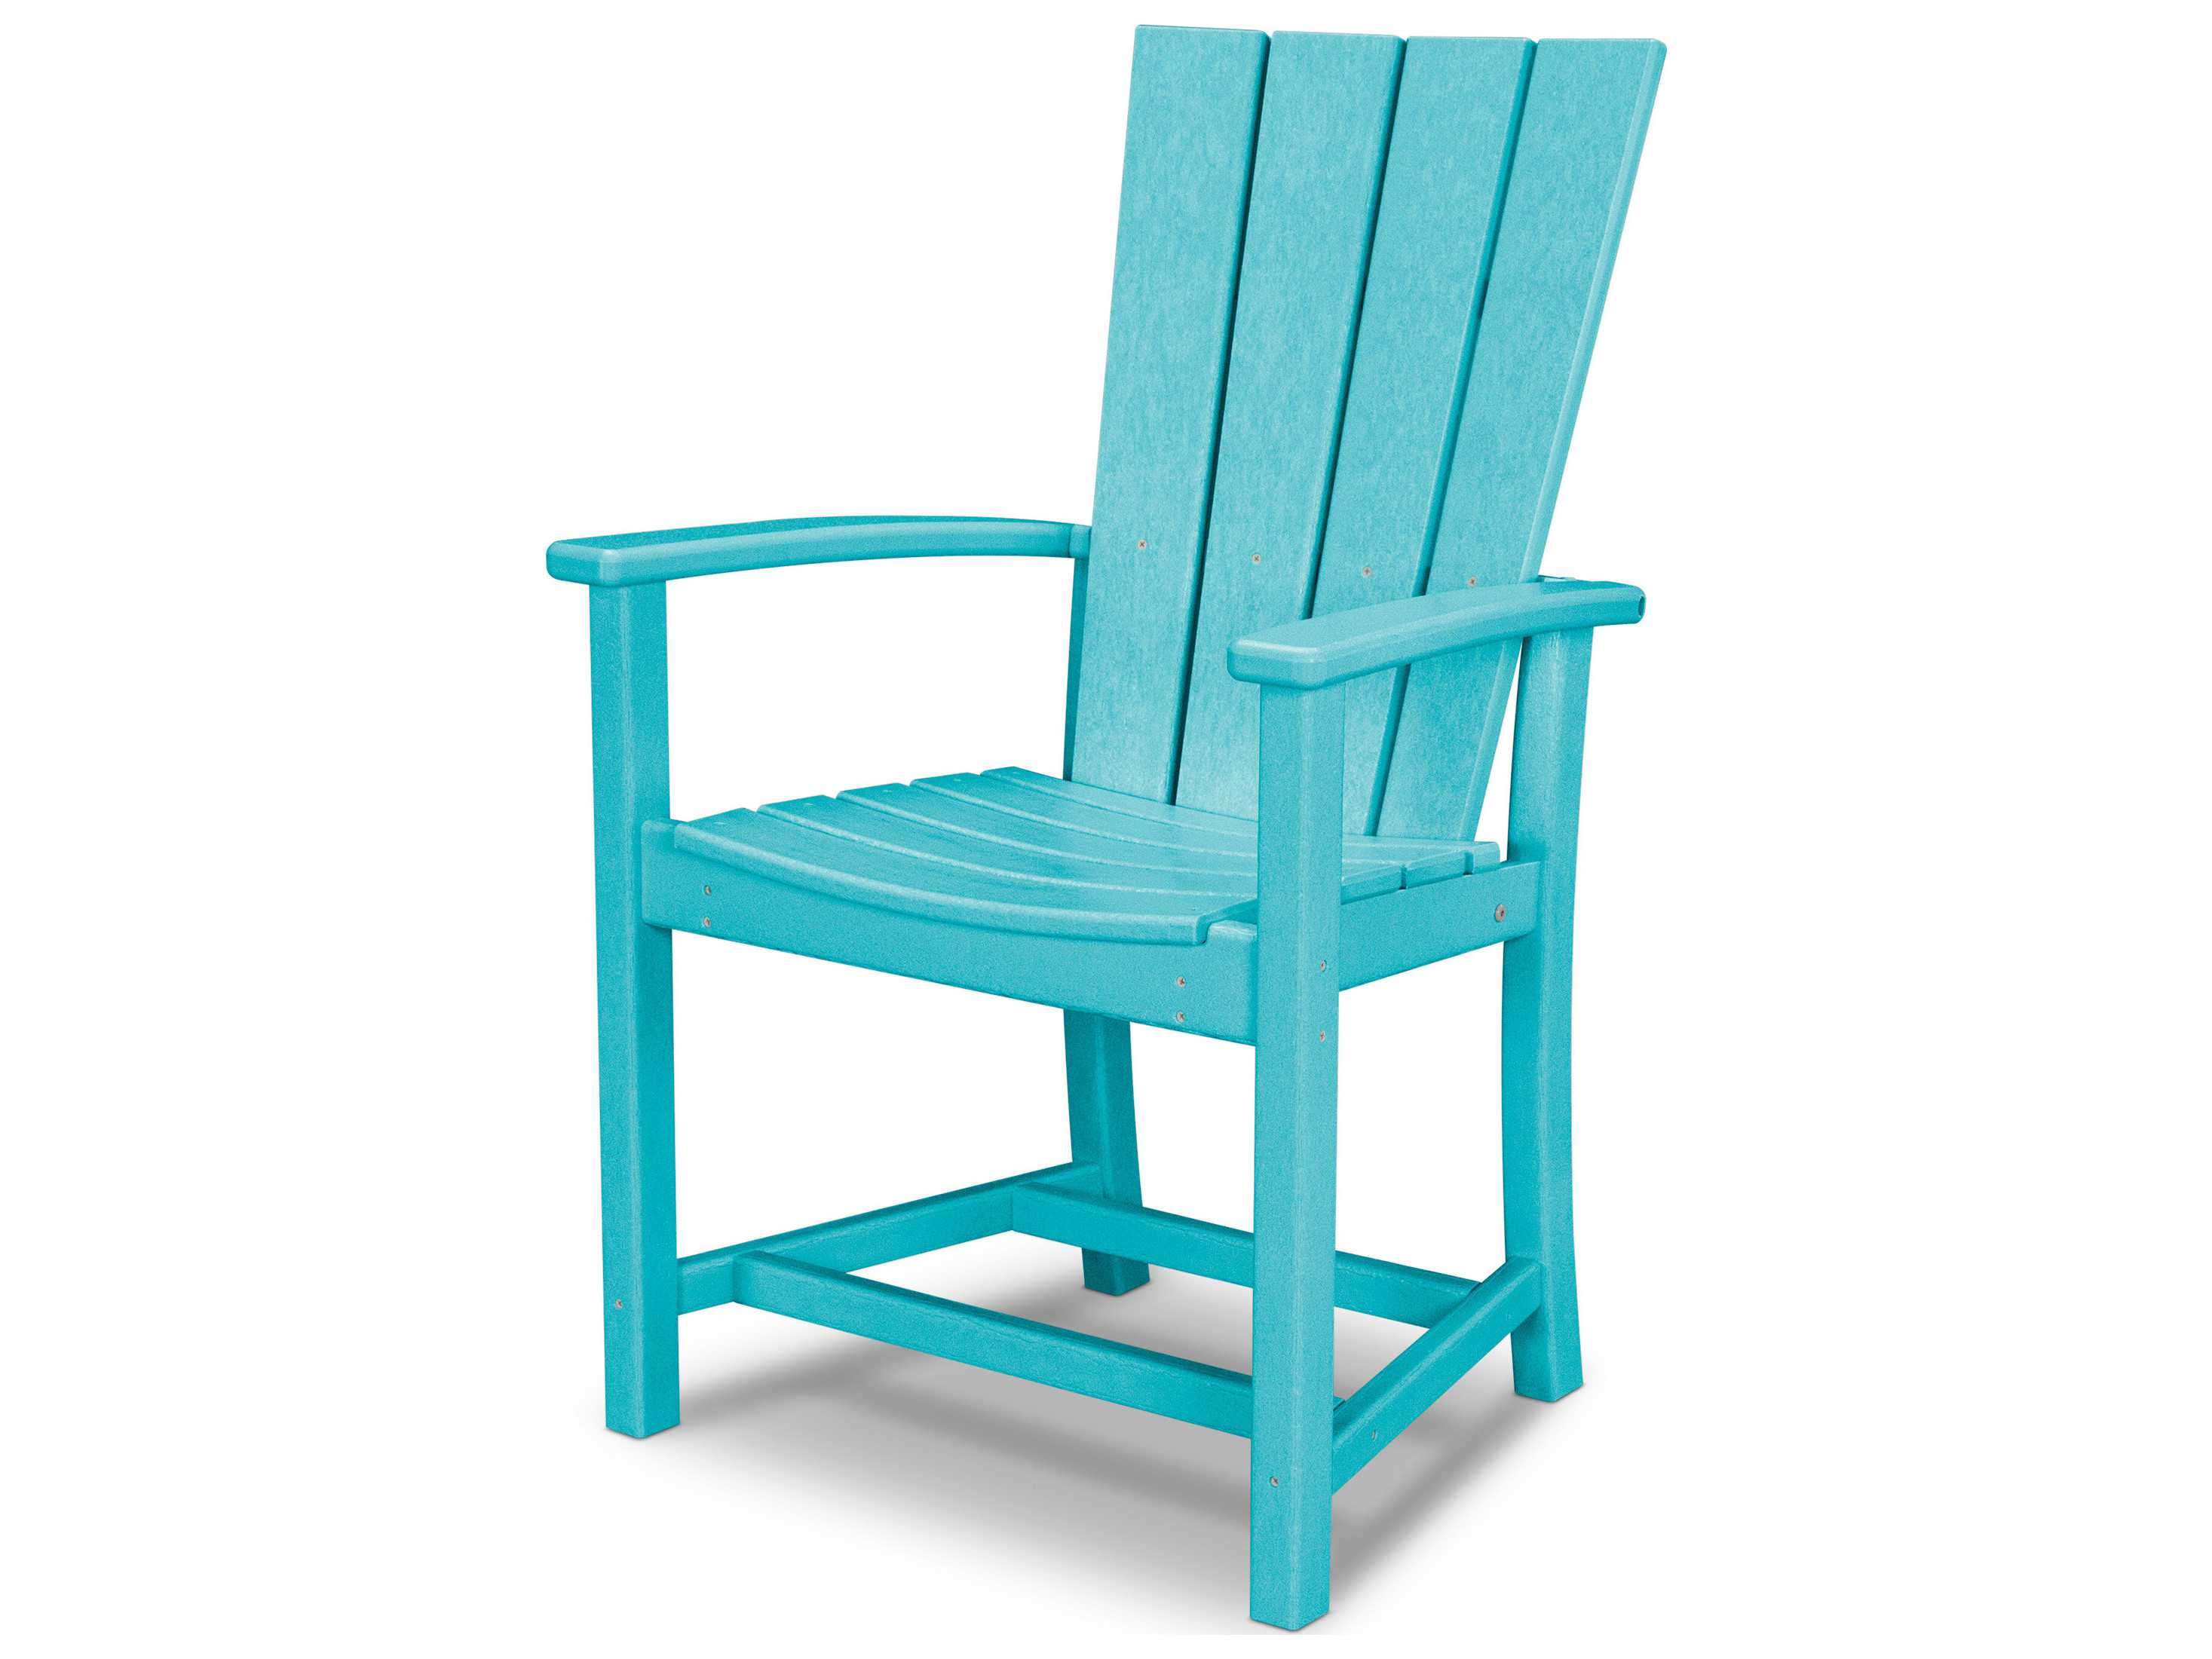 Polywood 174 Quattro Recycled Plastic Adirondack Dining Chair